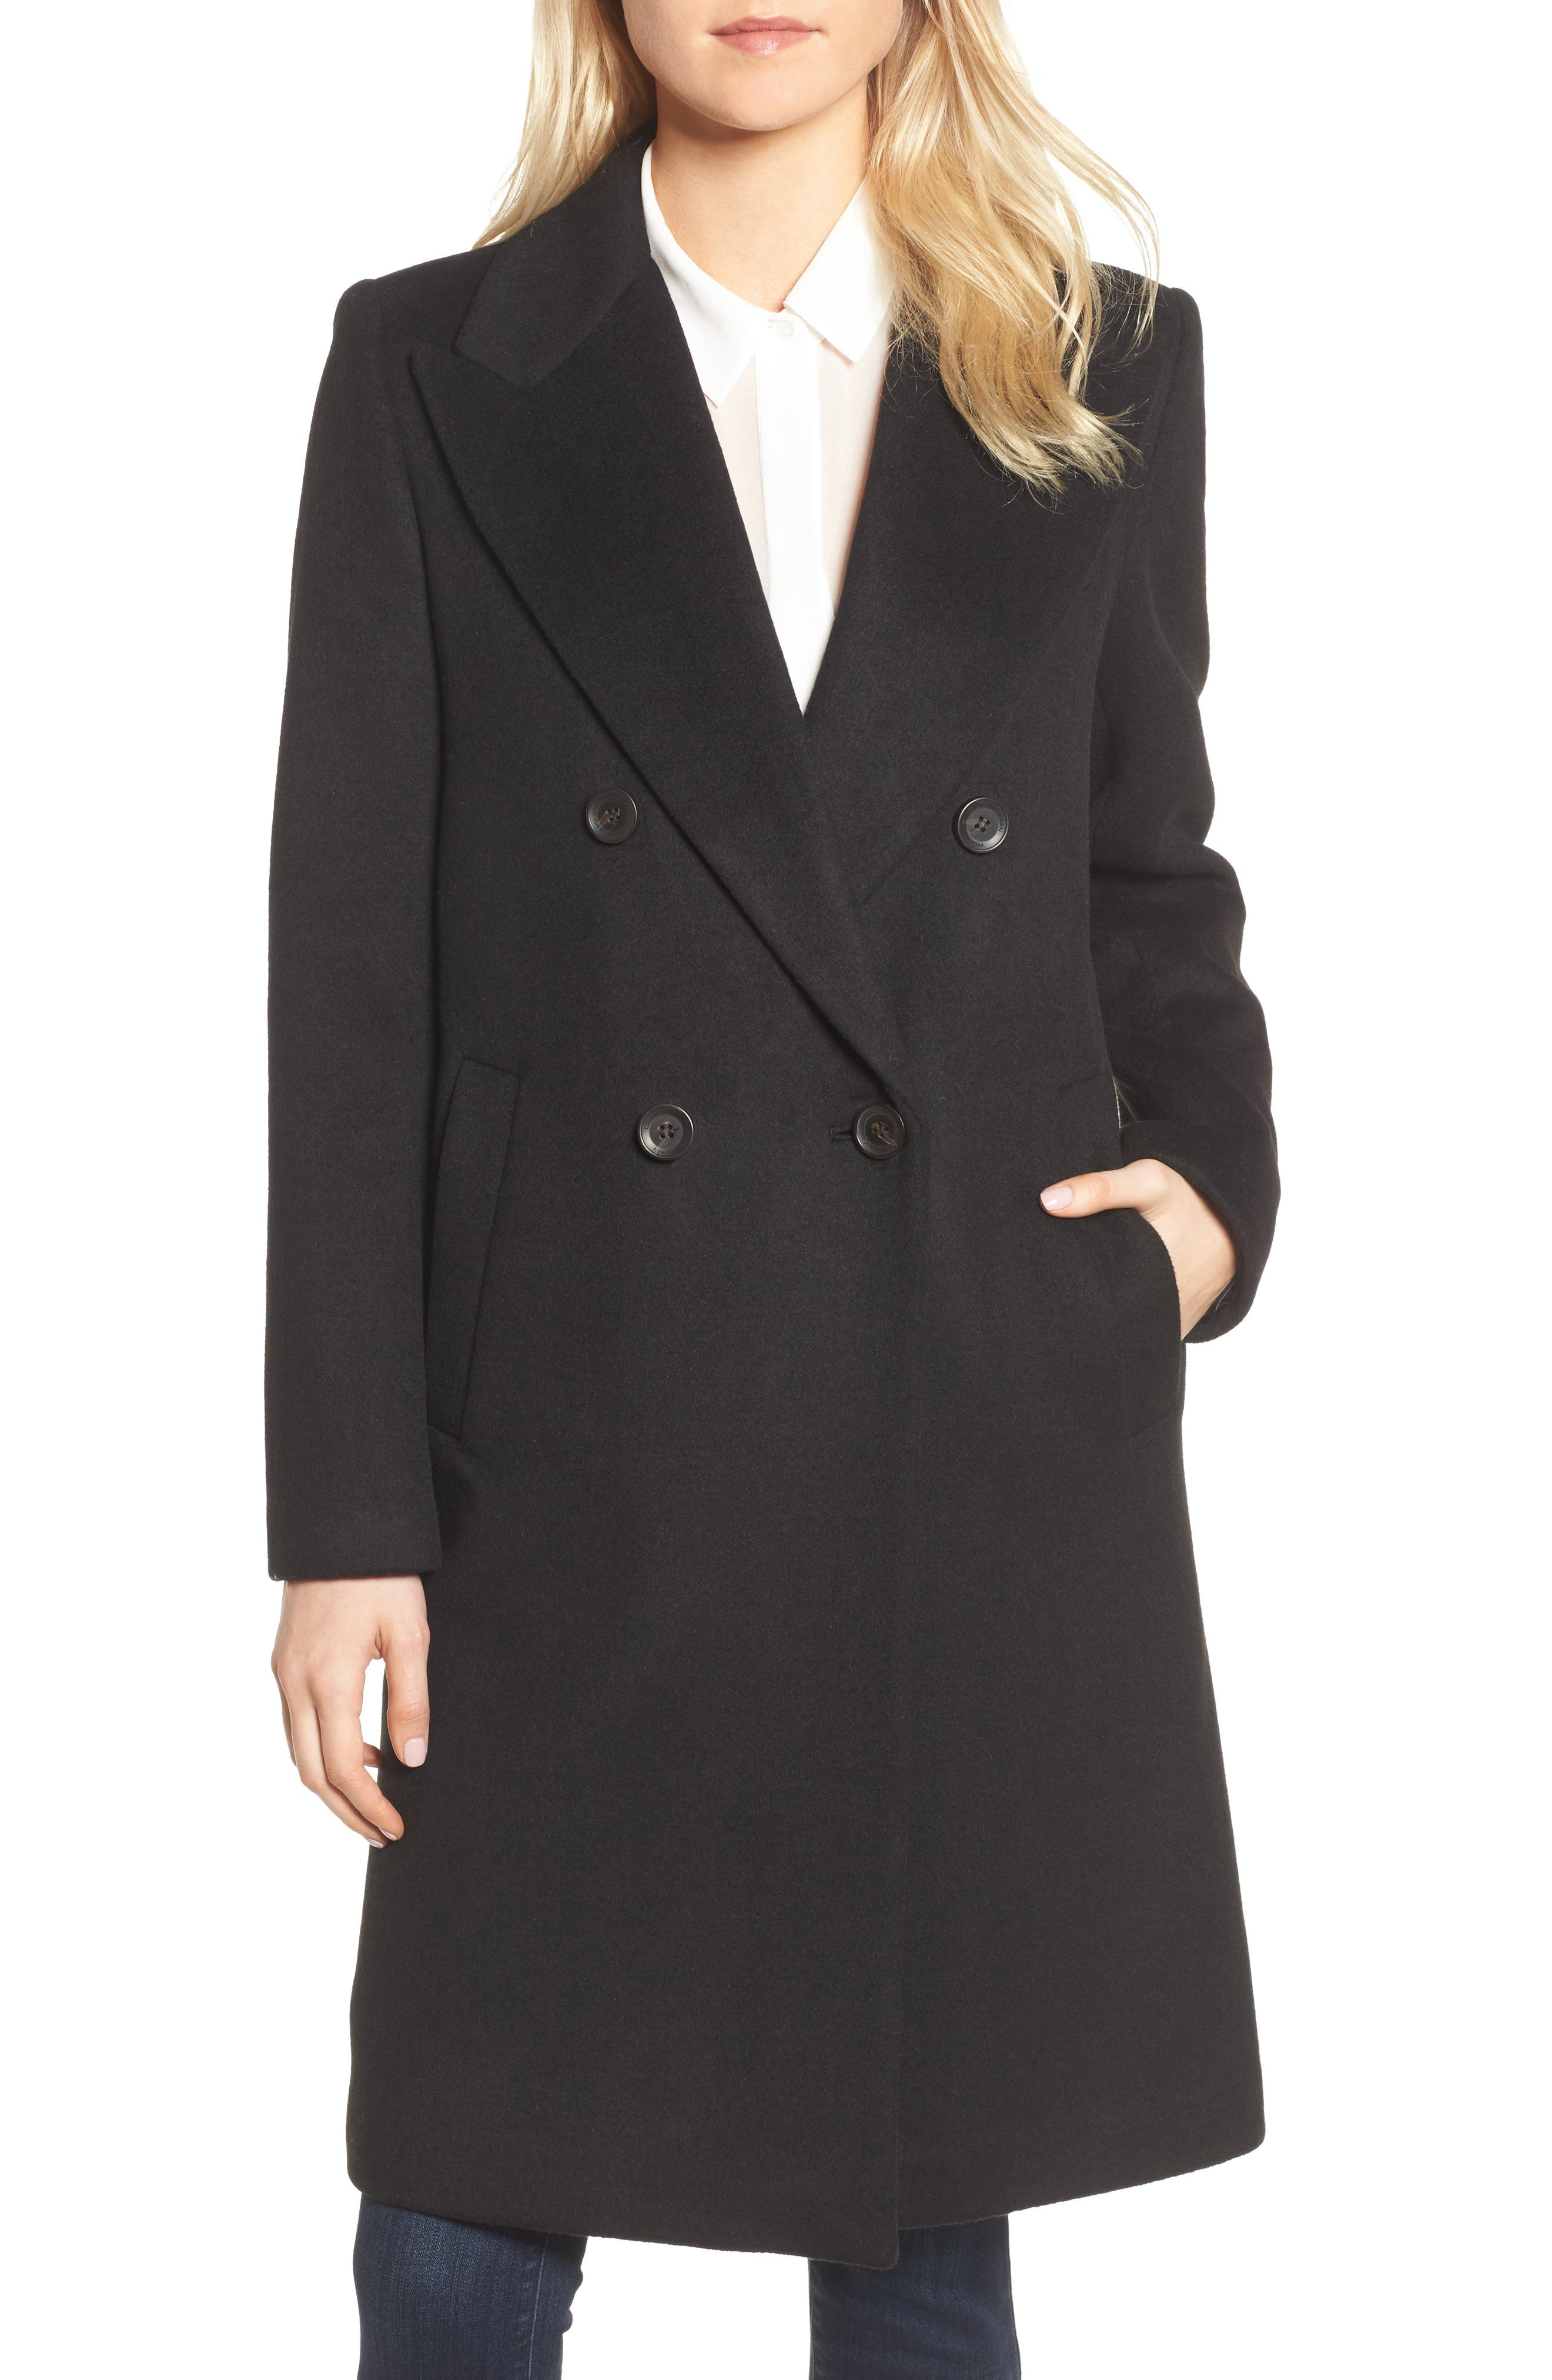 DKNY Lavish Wool Blend Coat,                             Main thumbnail 1, color,                             001